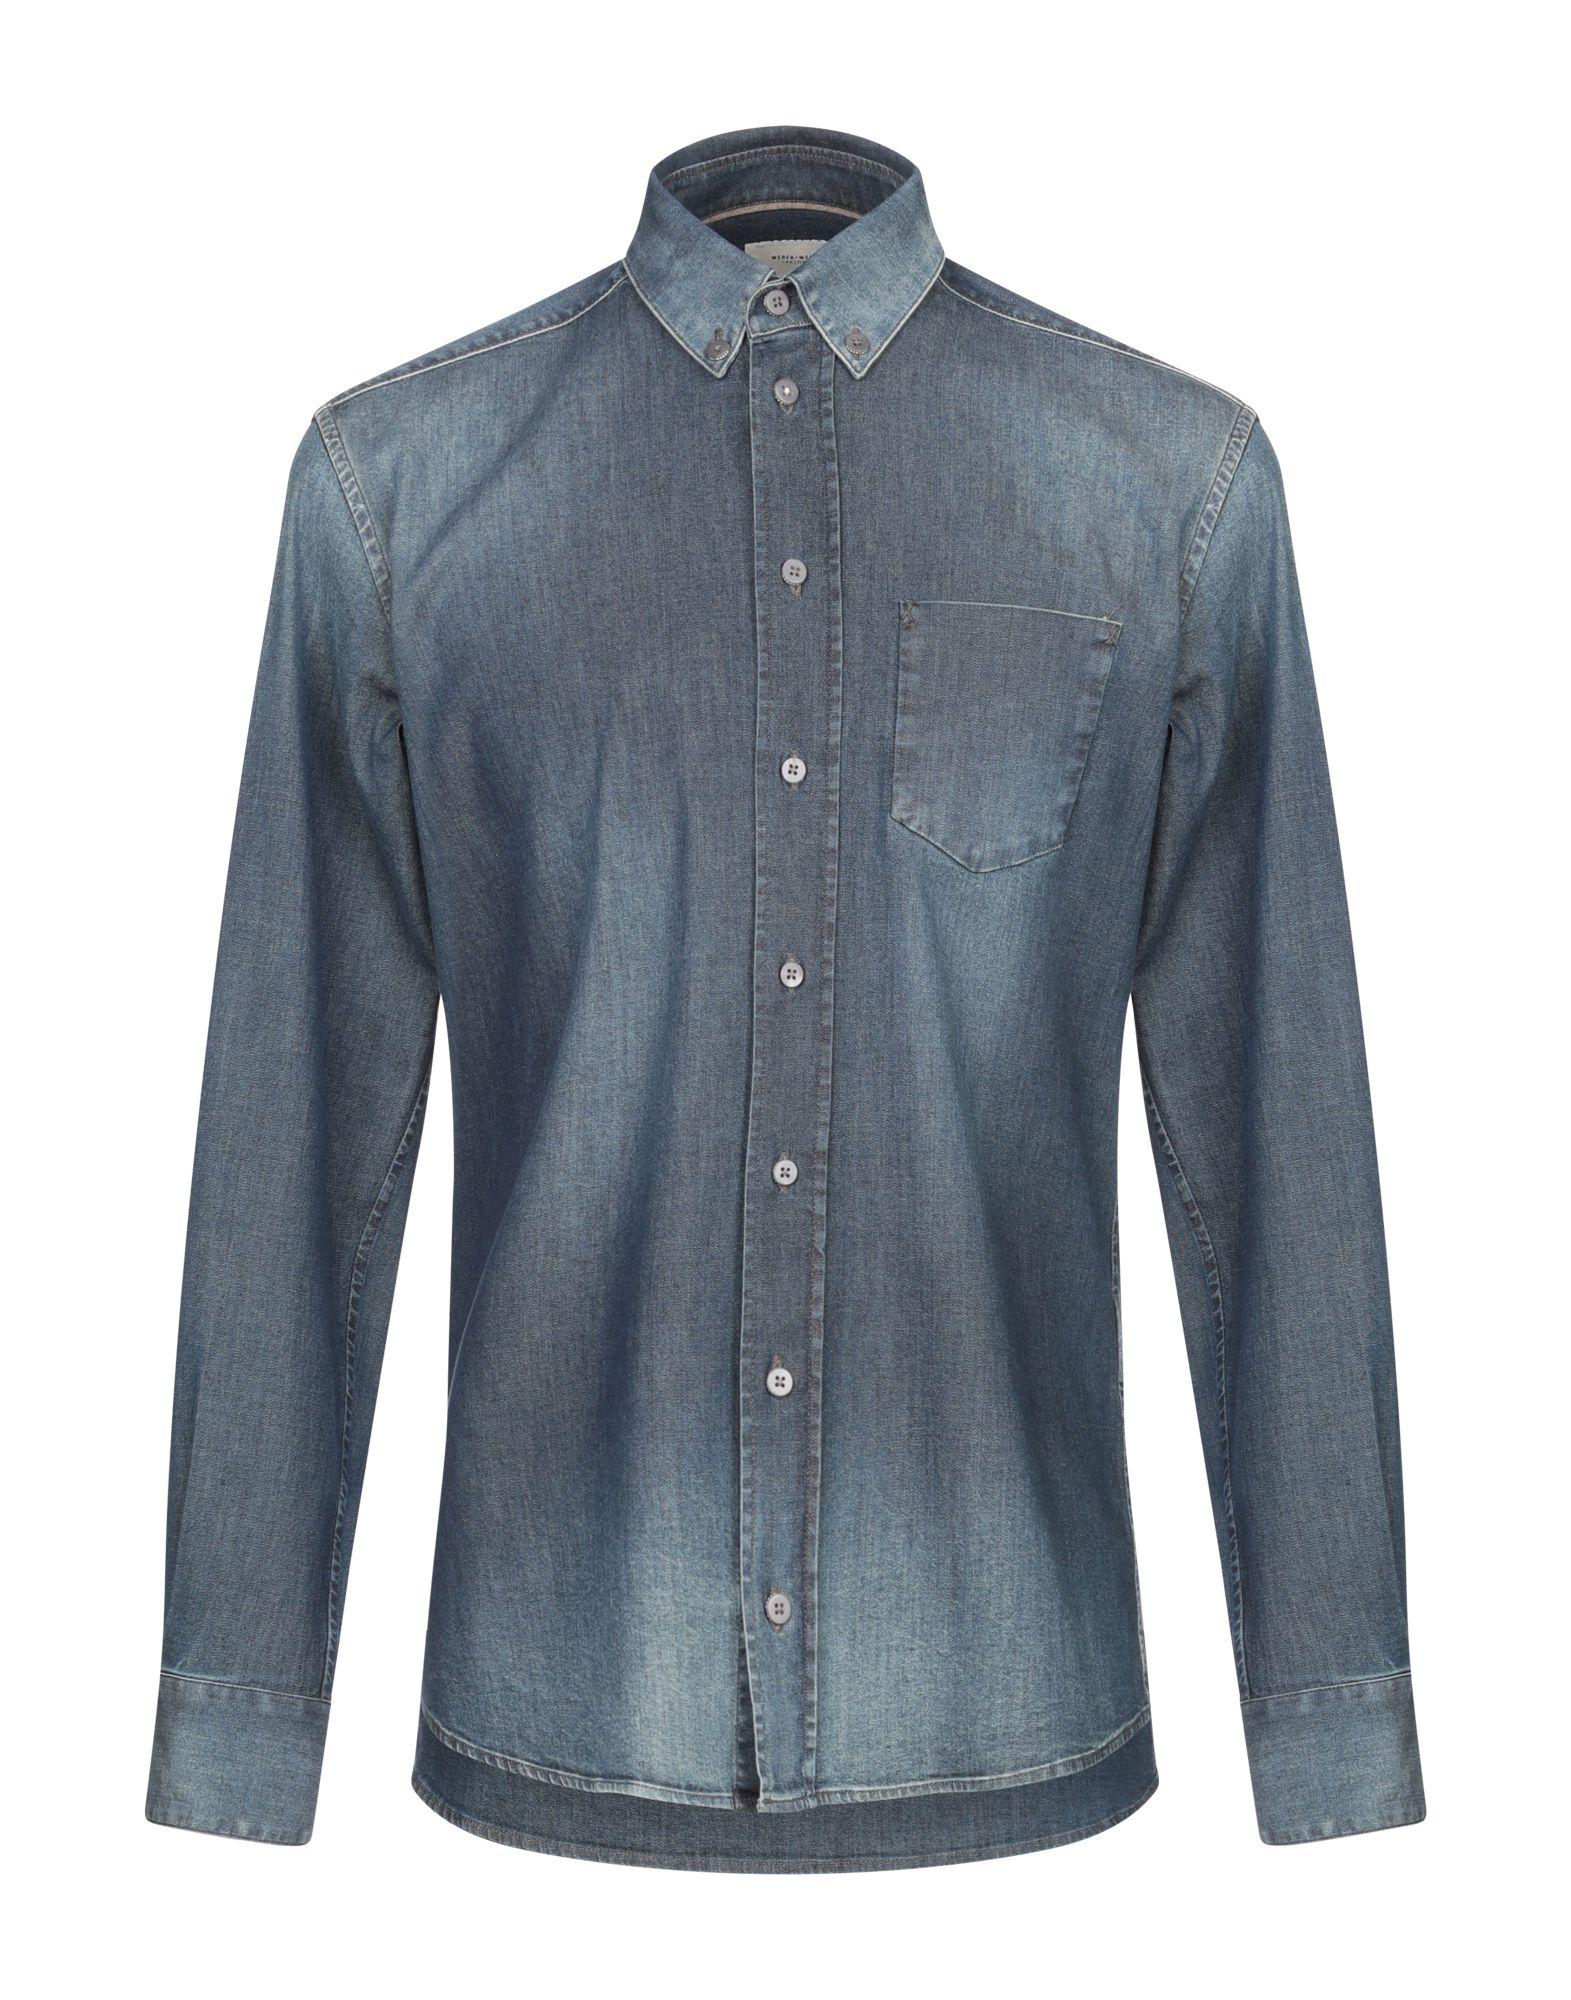 WEBER+WEBER SARTORIA Джинсовая рубашка